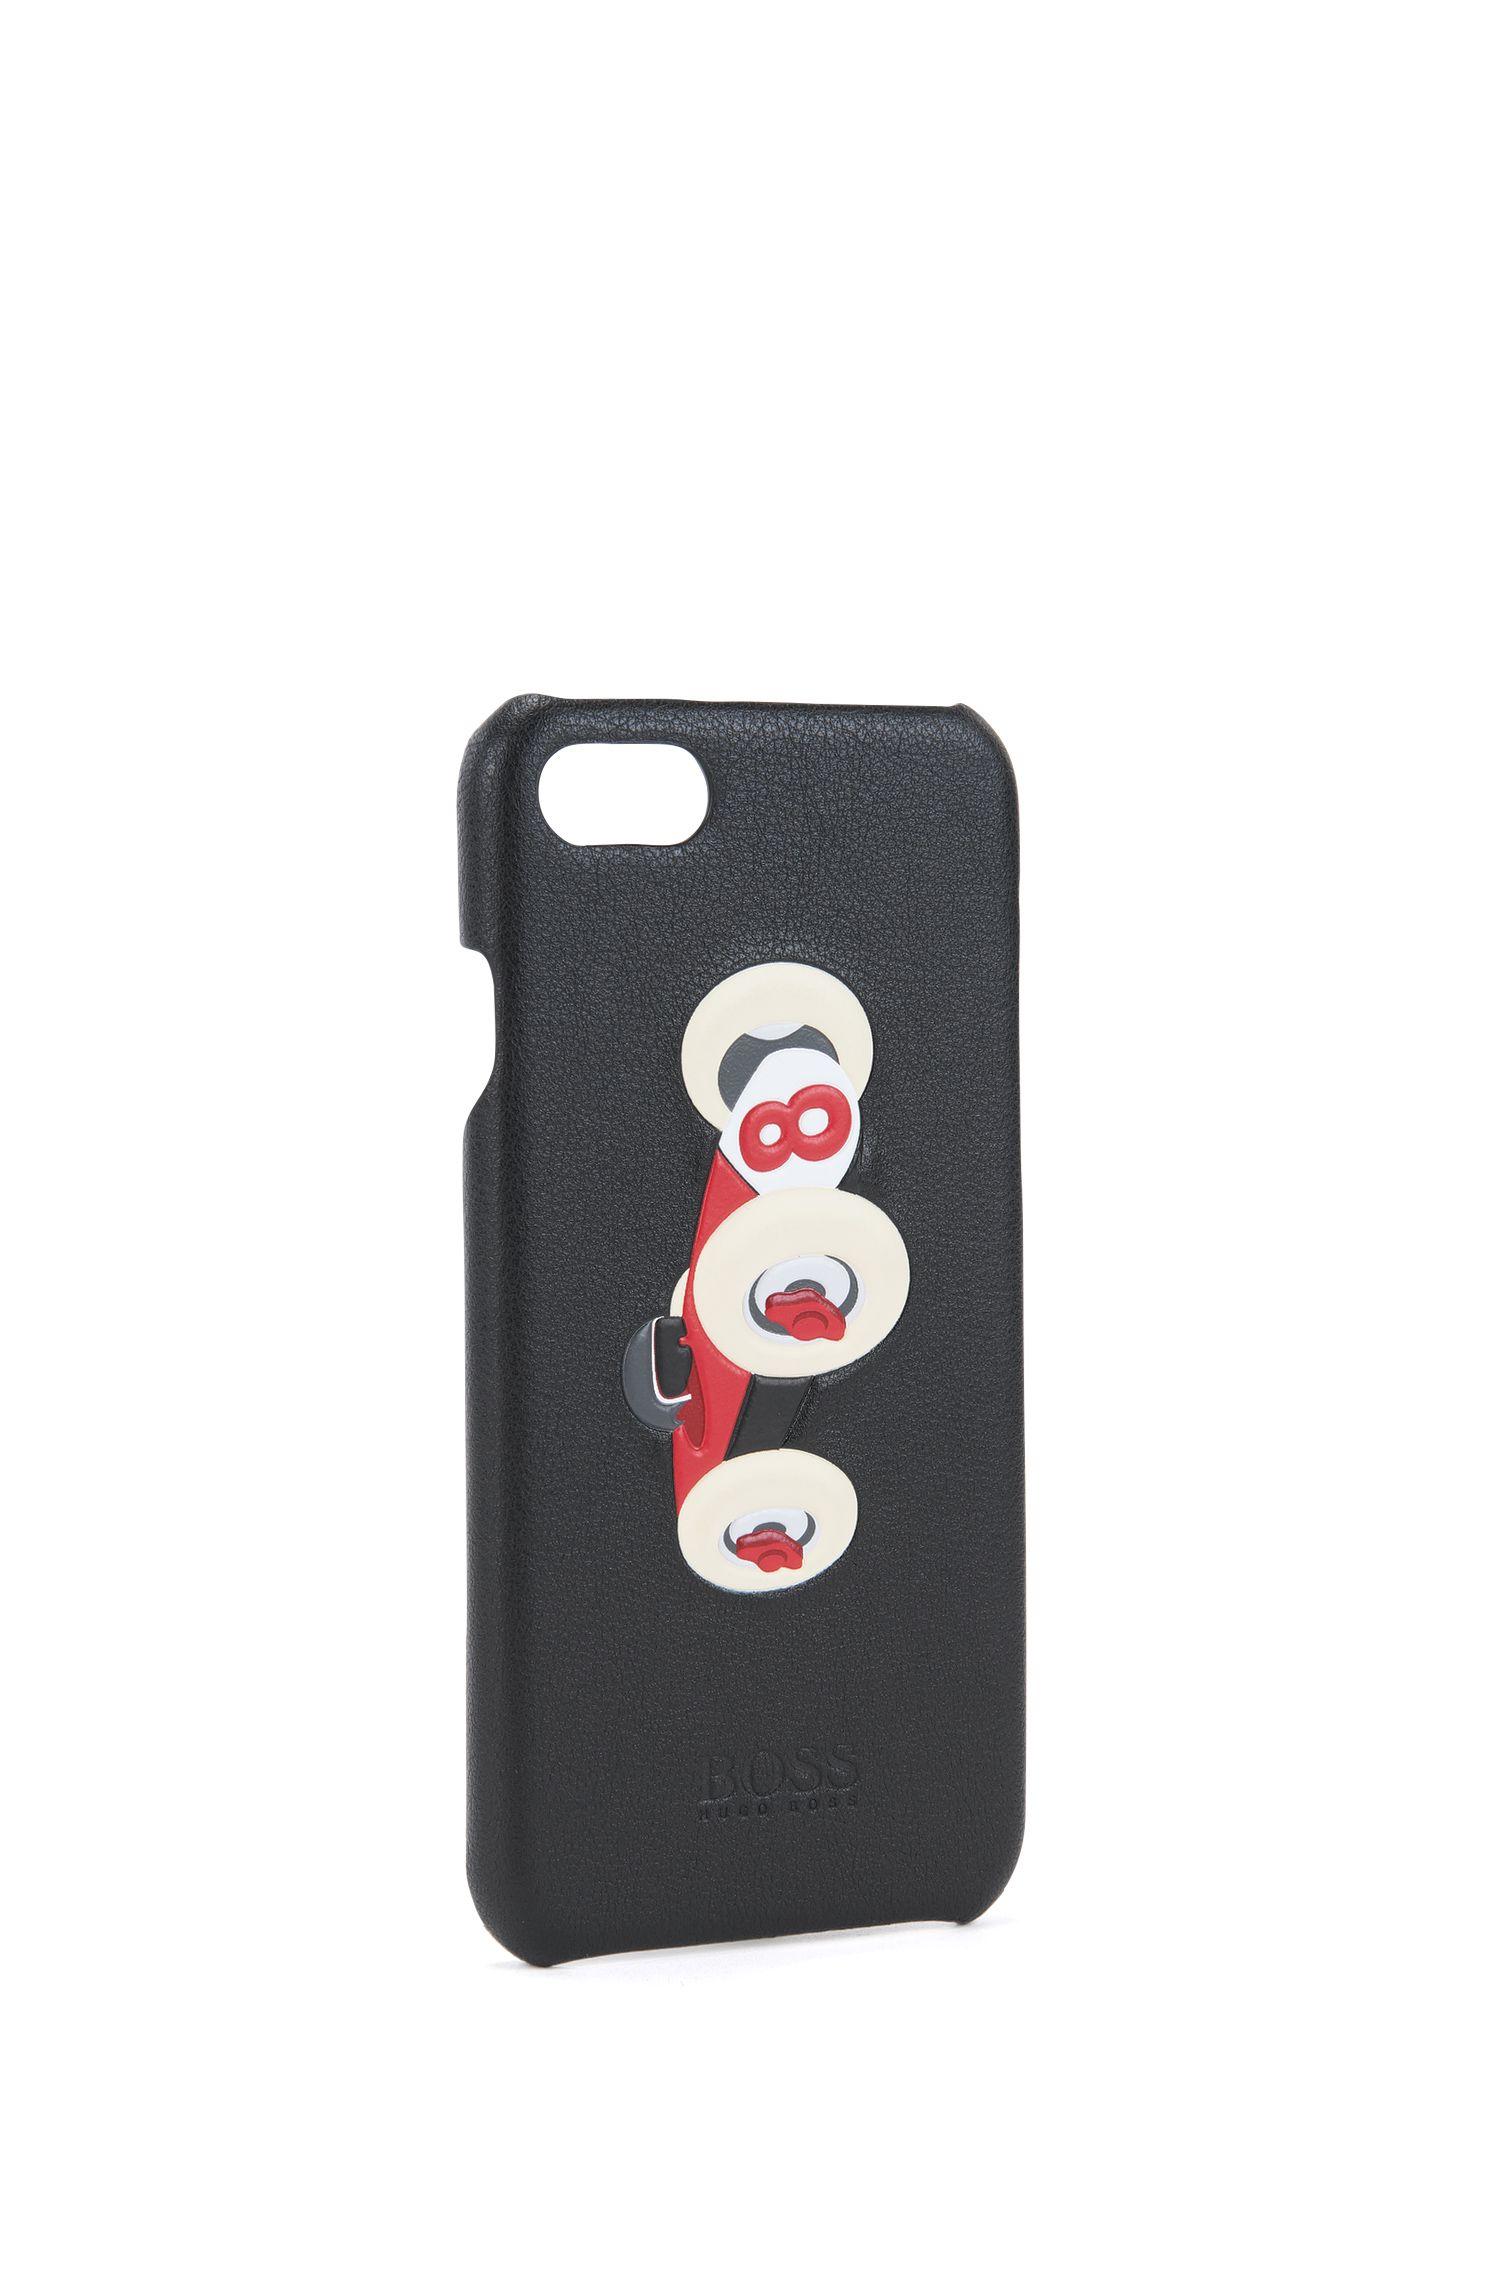 Racecar Leather iPhone 7 Case | HB Road Phone 7